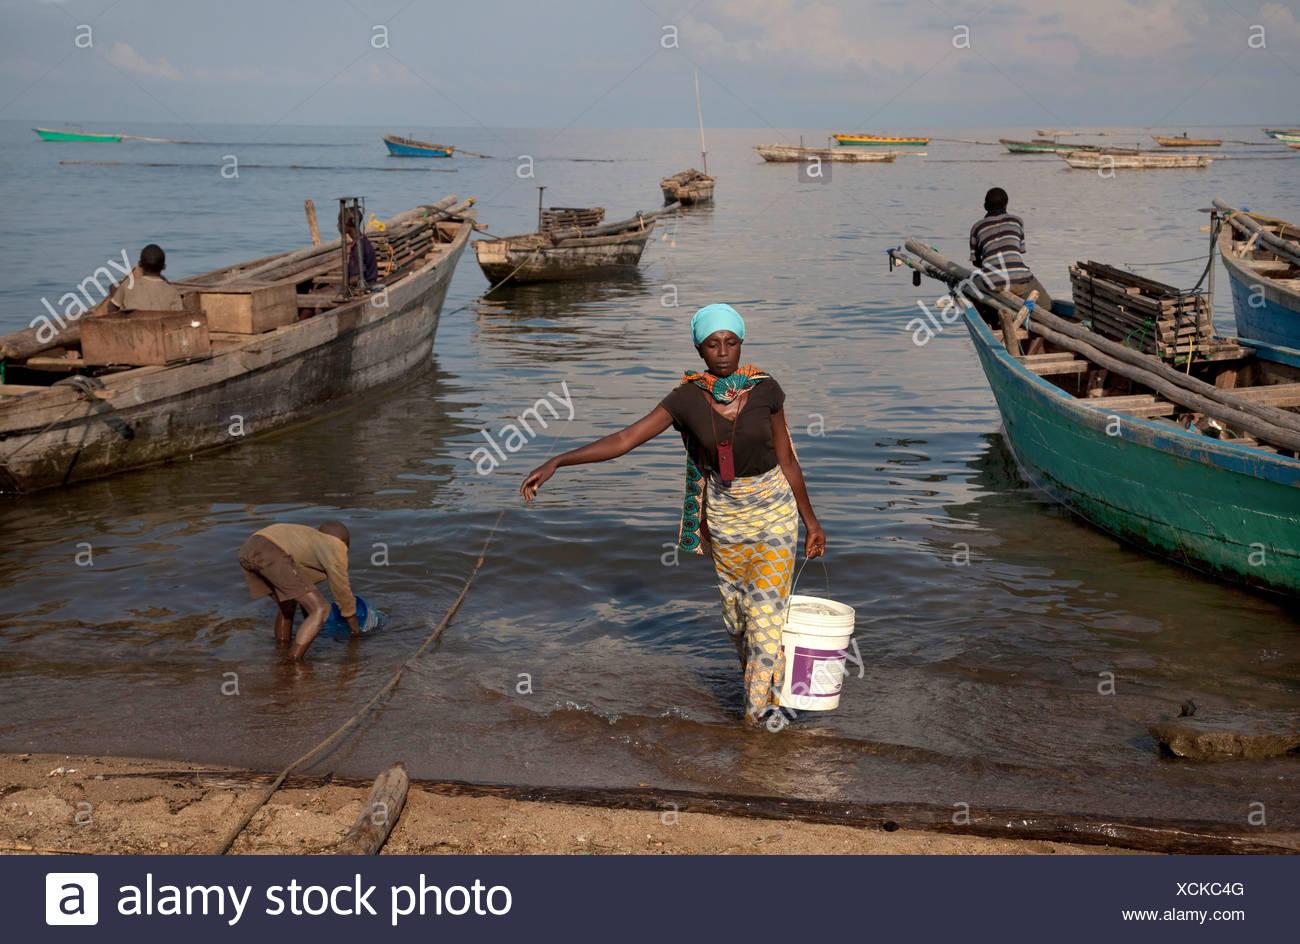 woman bringing a bucket of water, Burundi, Mvugo, Nyanza Lac - Stock Image